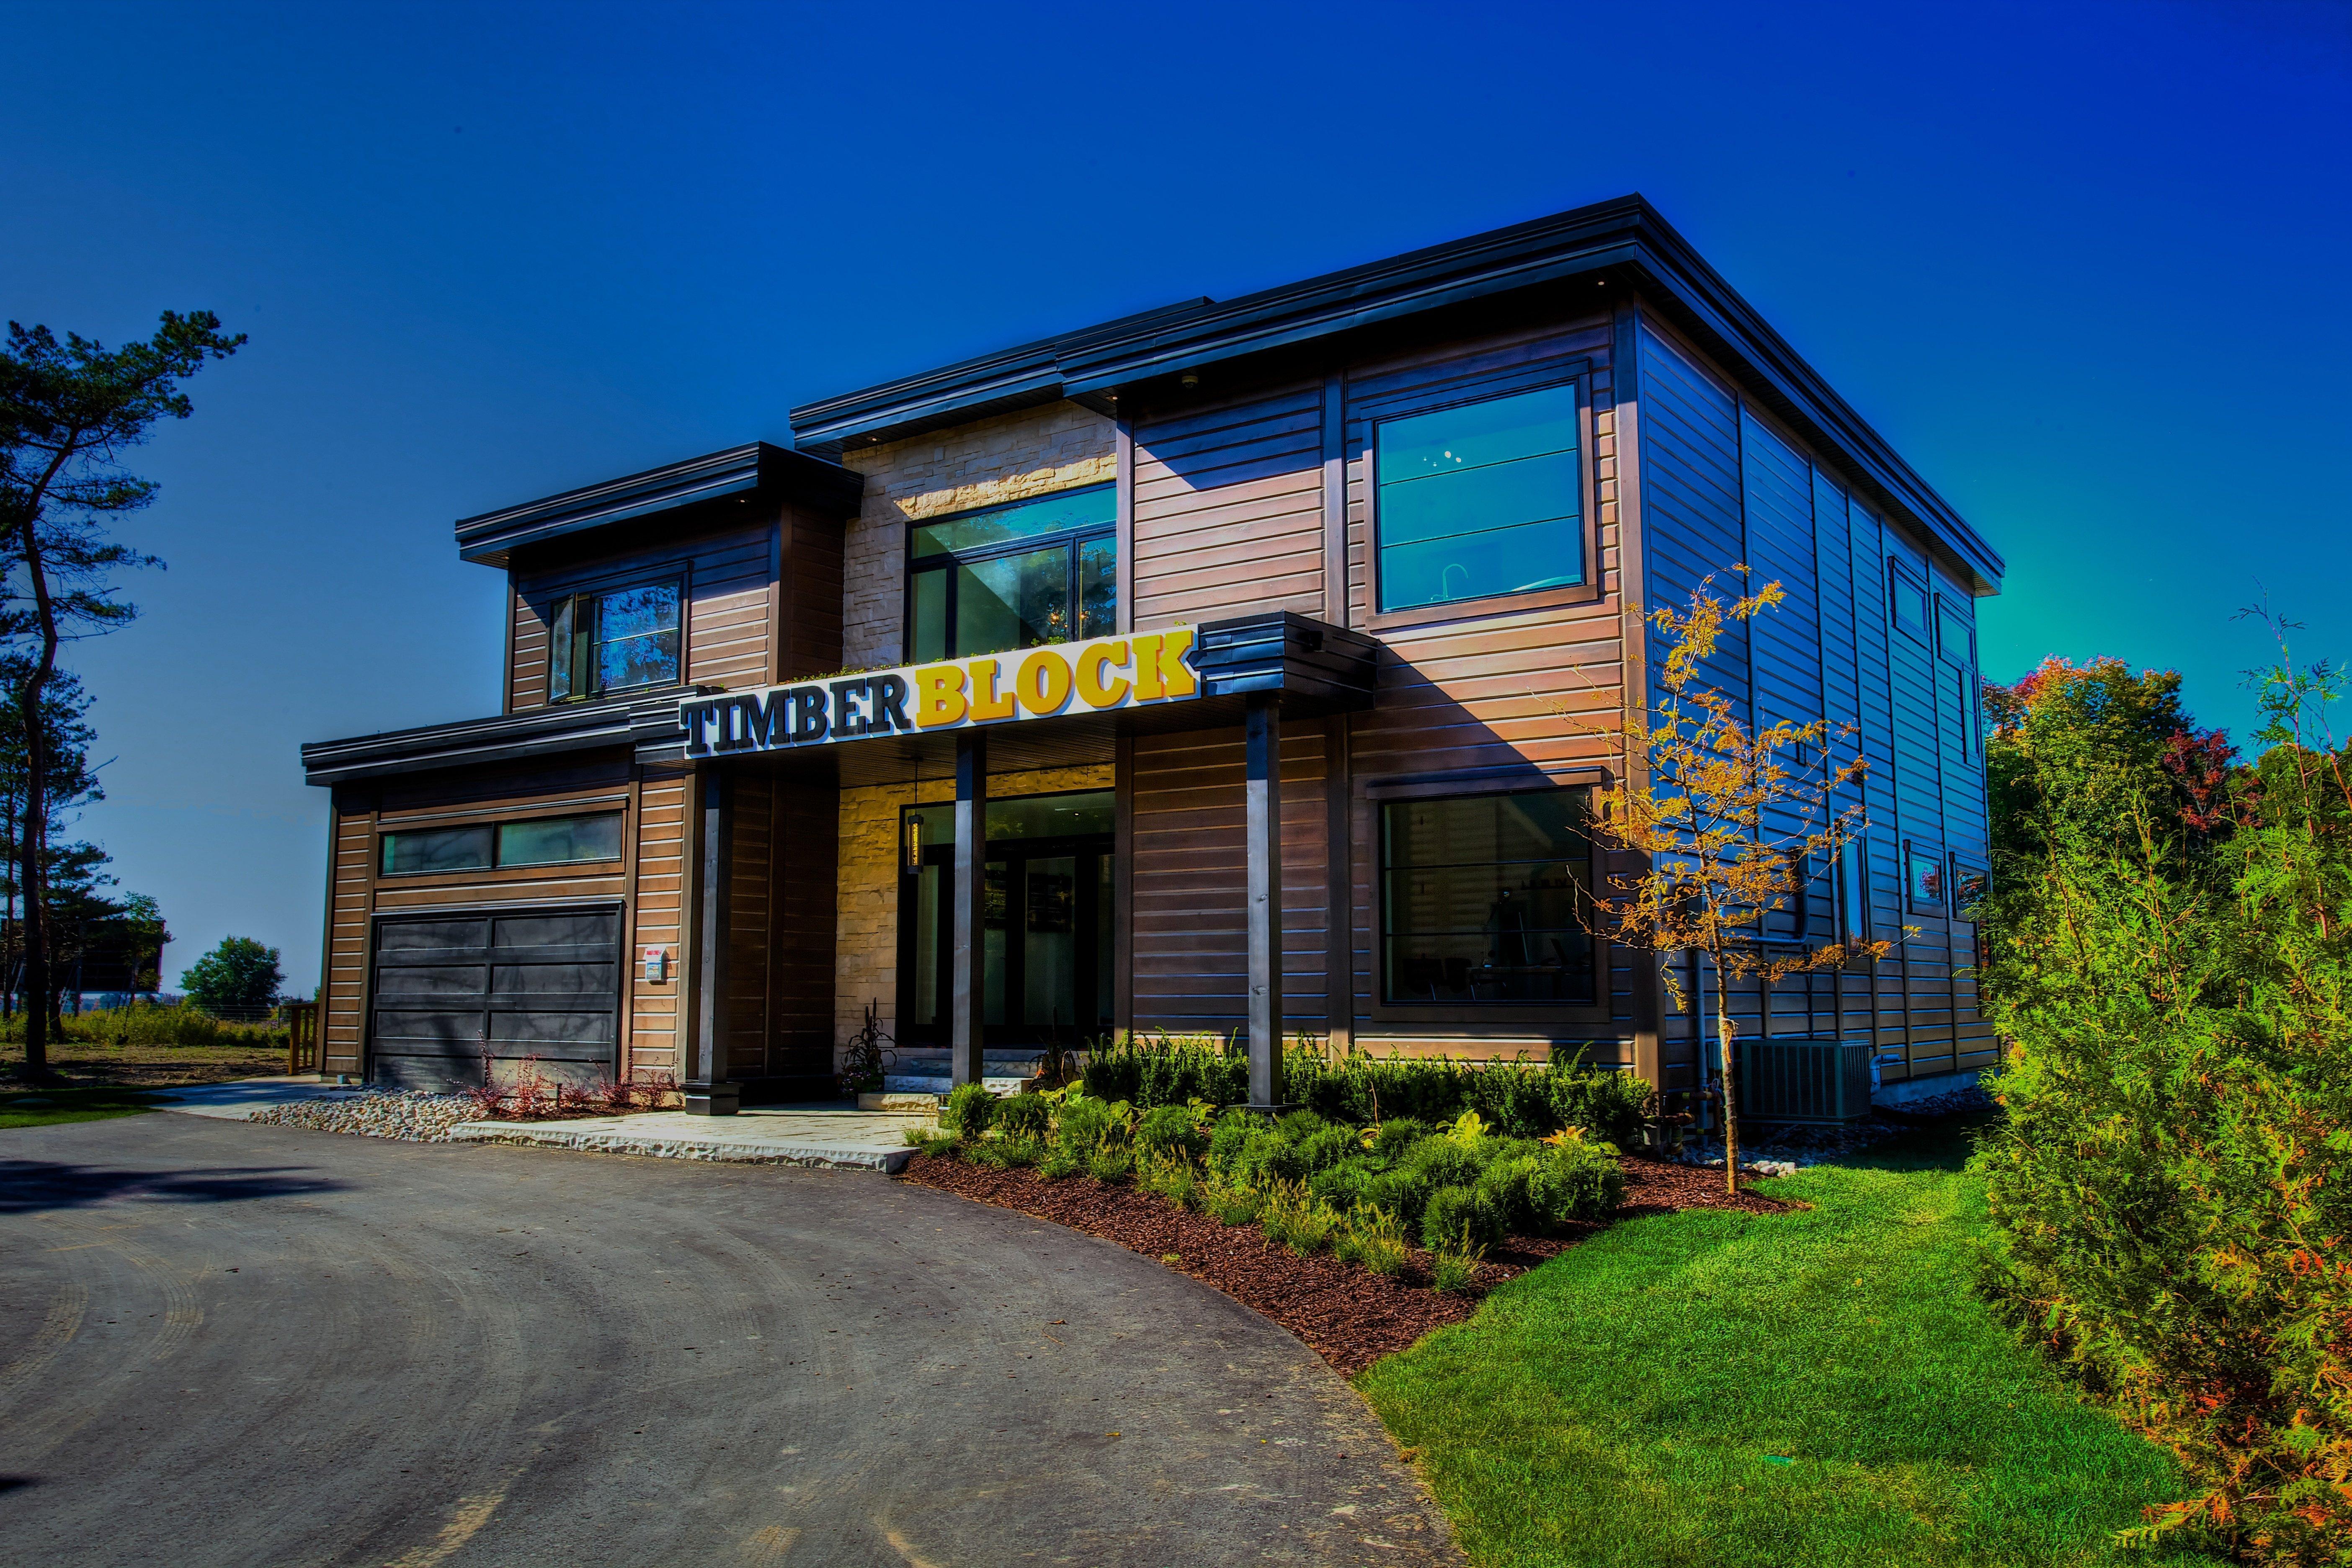 Timber Block Milano Model Home Sales Center